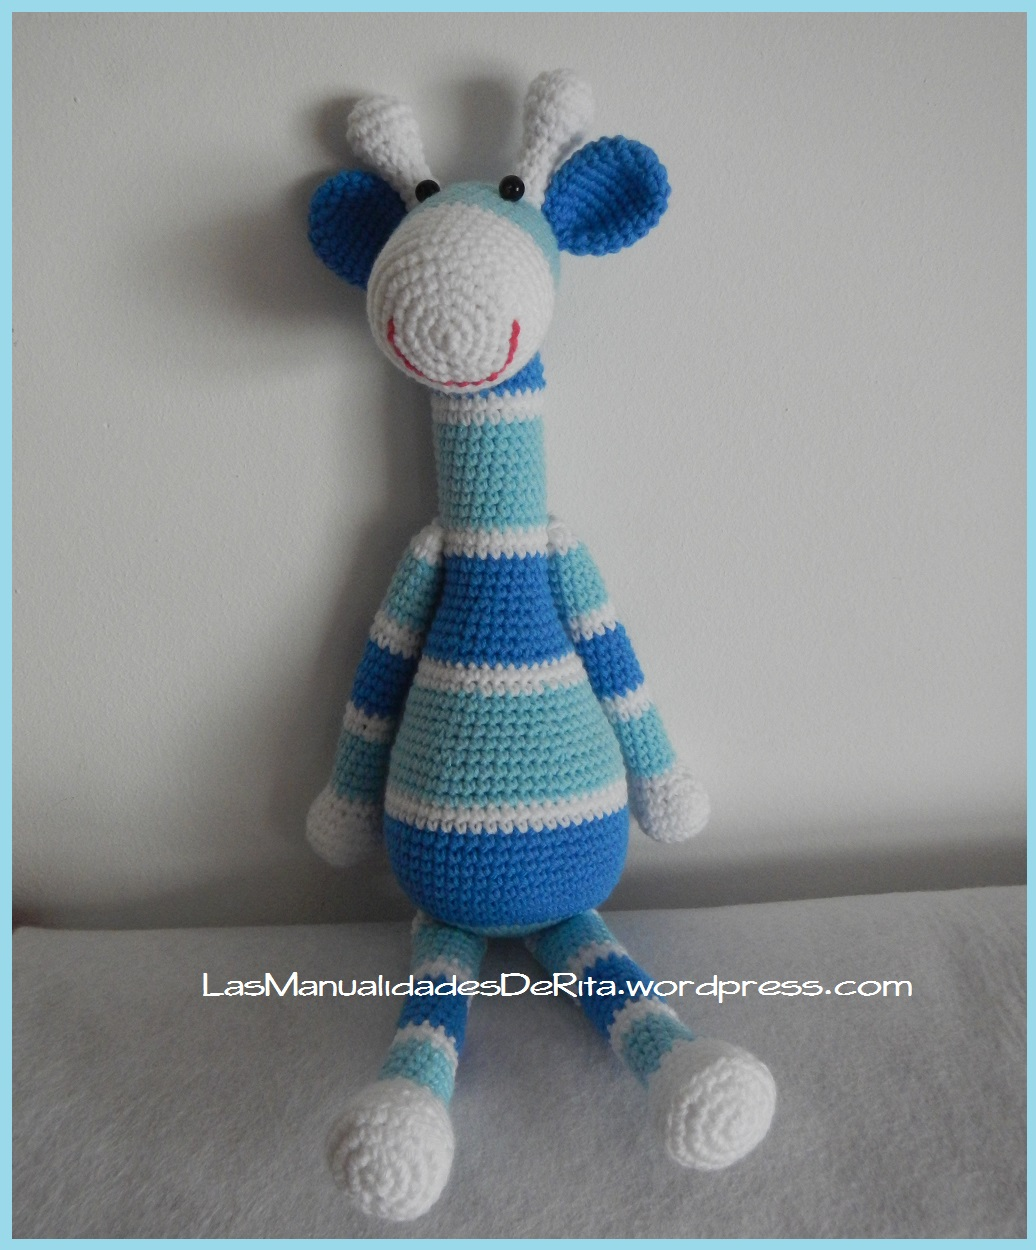 Crochet Giraffe PATTERN Amigurumi giraffe pattern pdf tutorial ... | 1250x1036